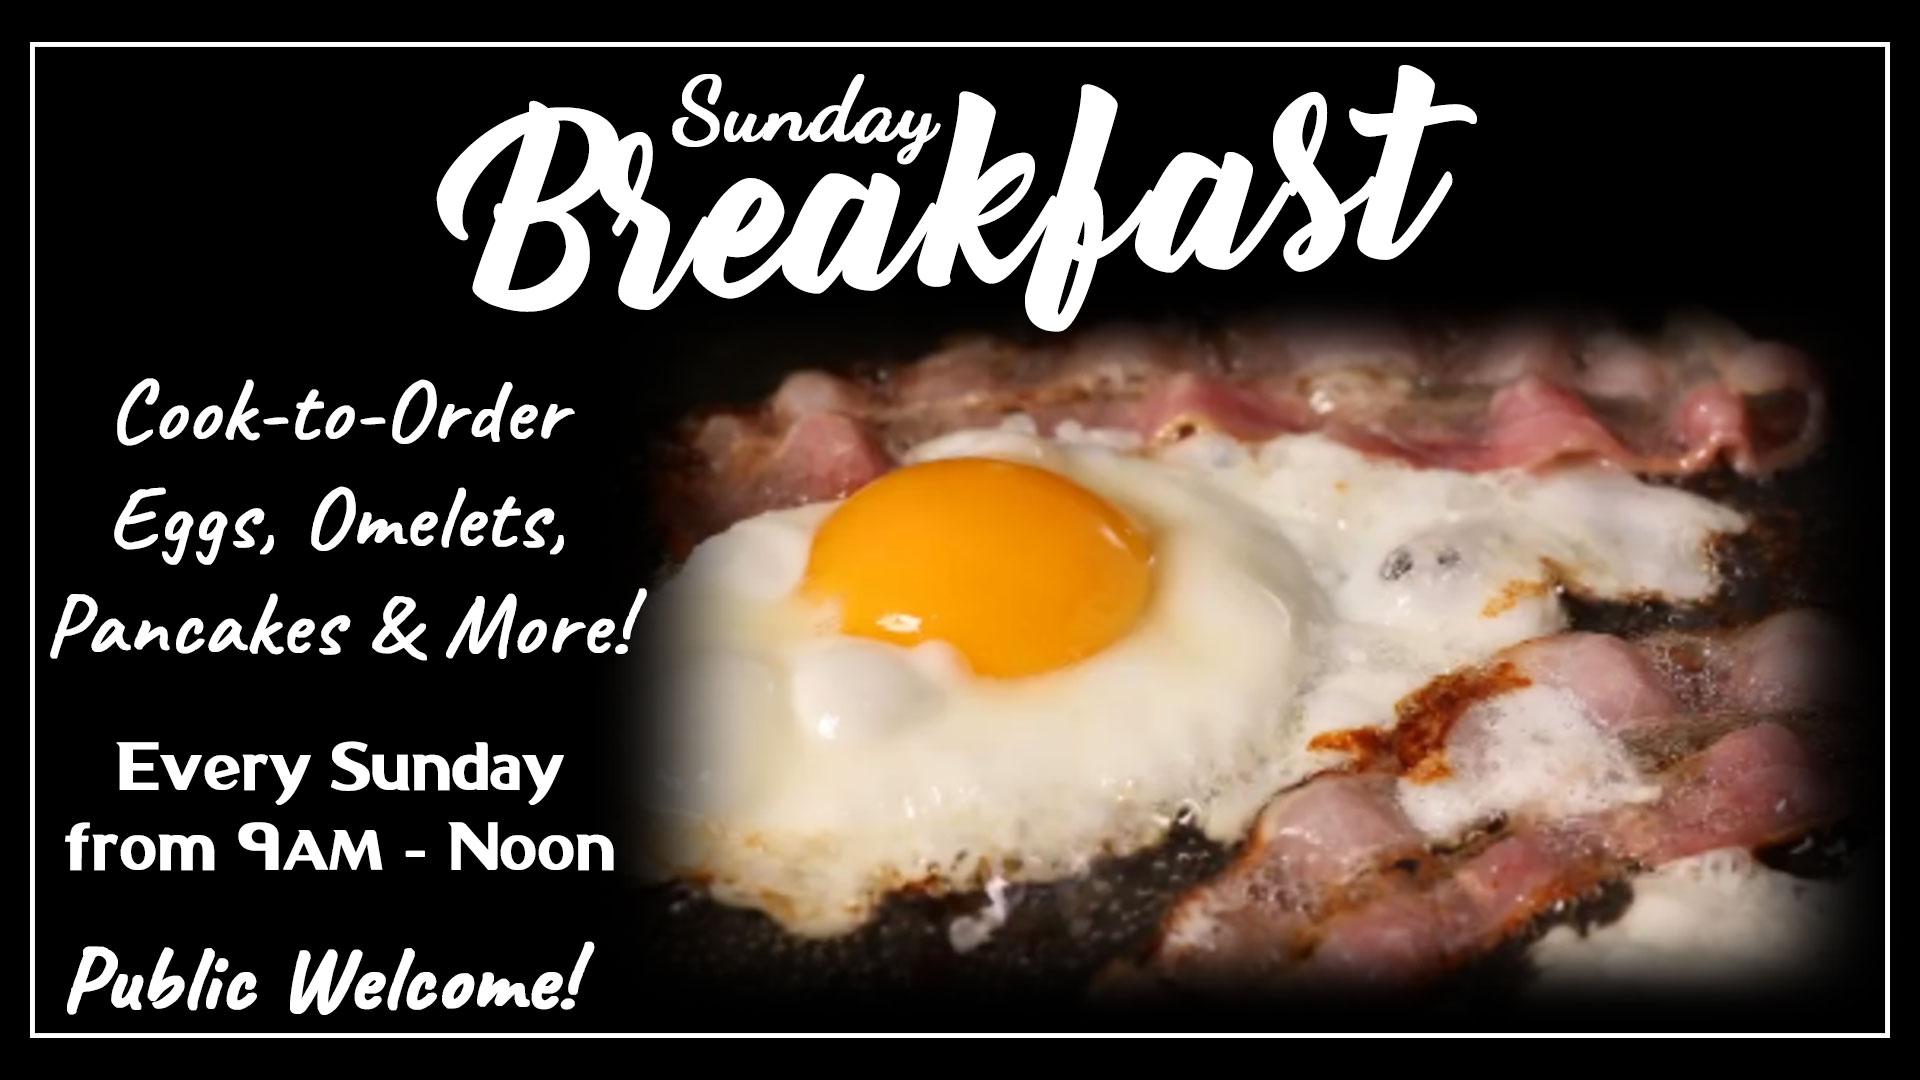 SUnday Breakfast Image